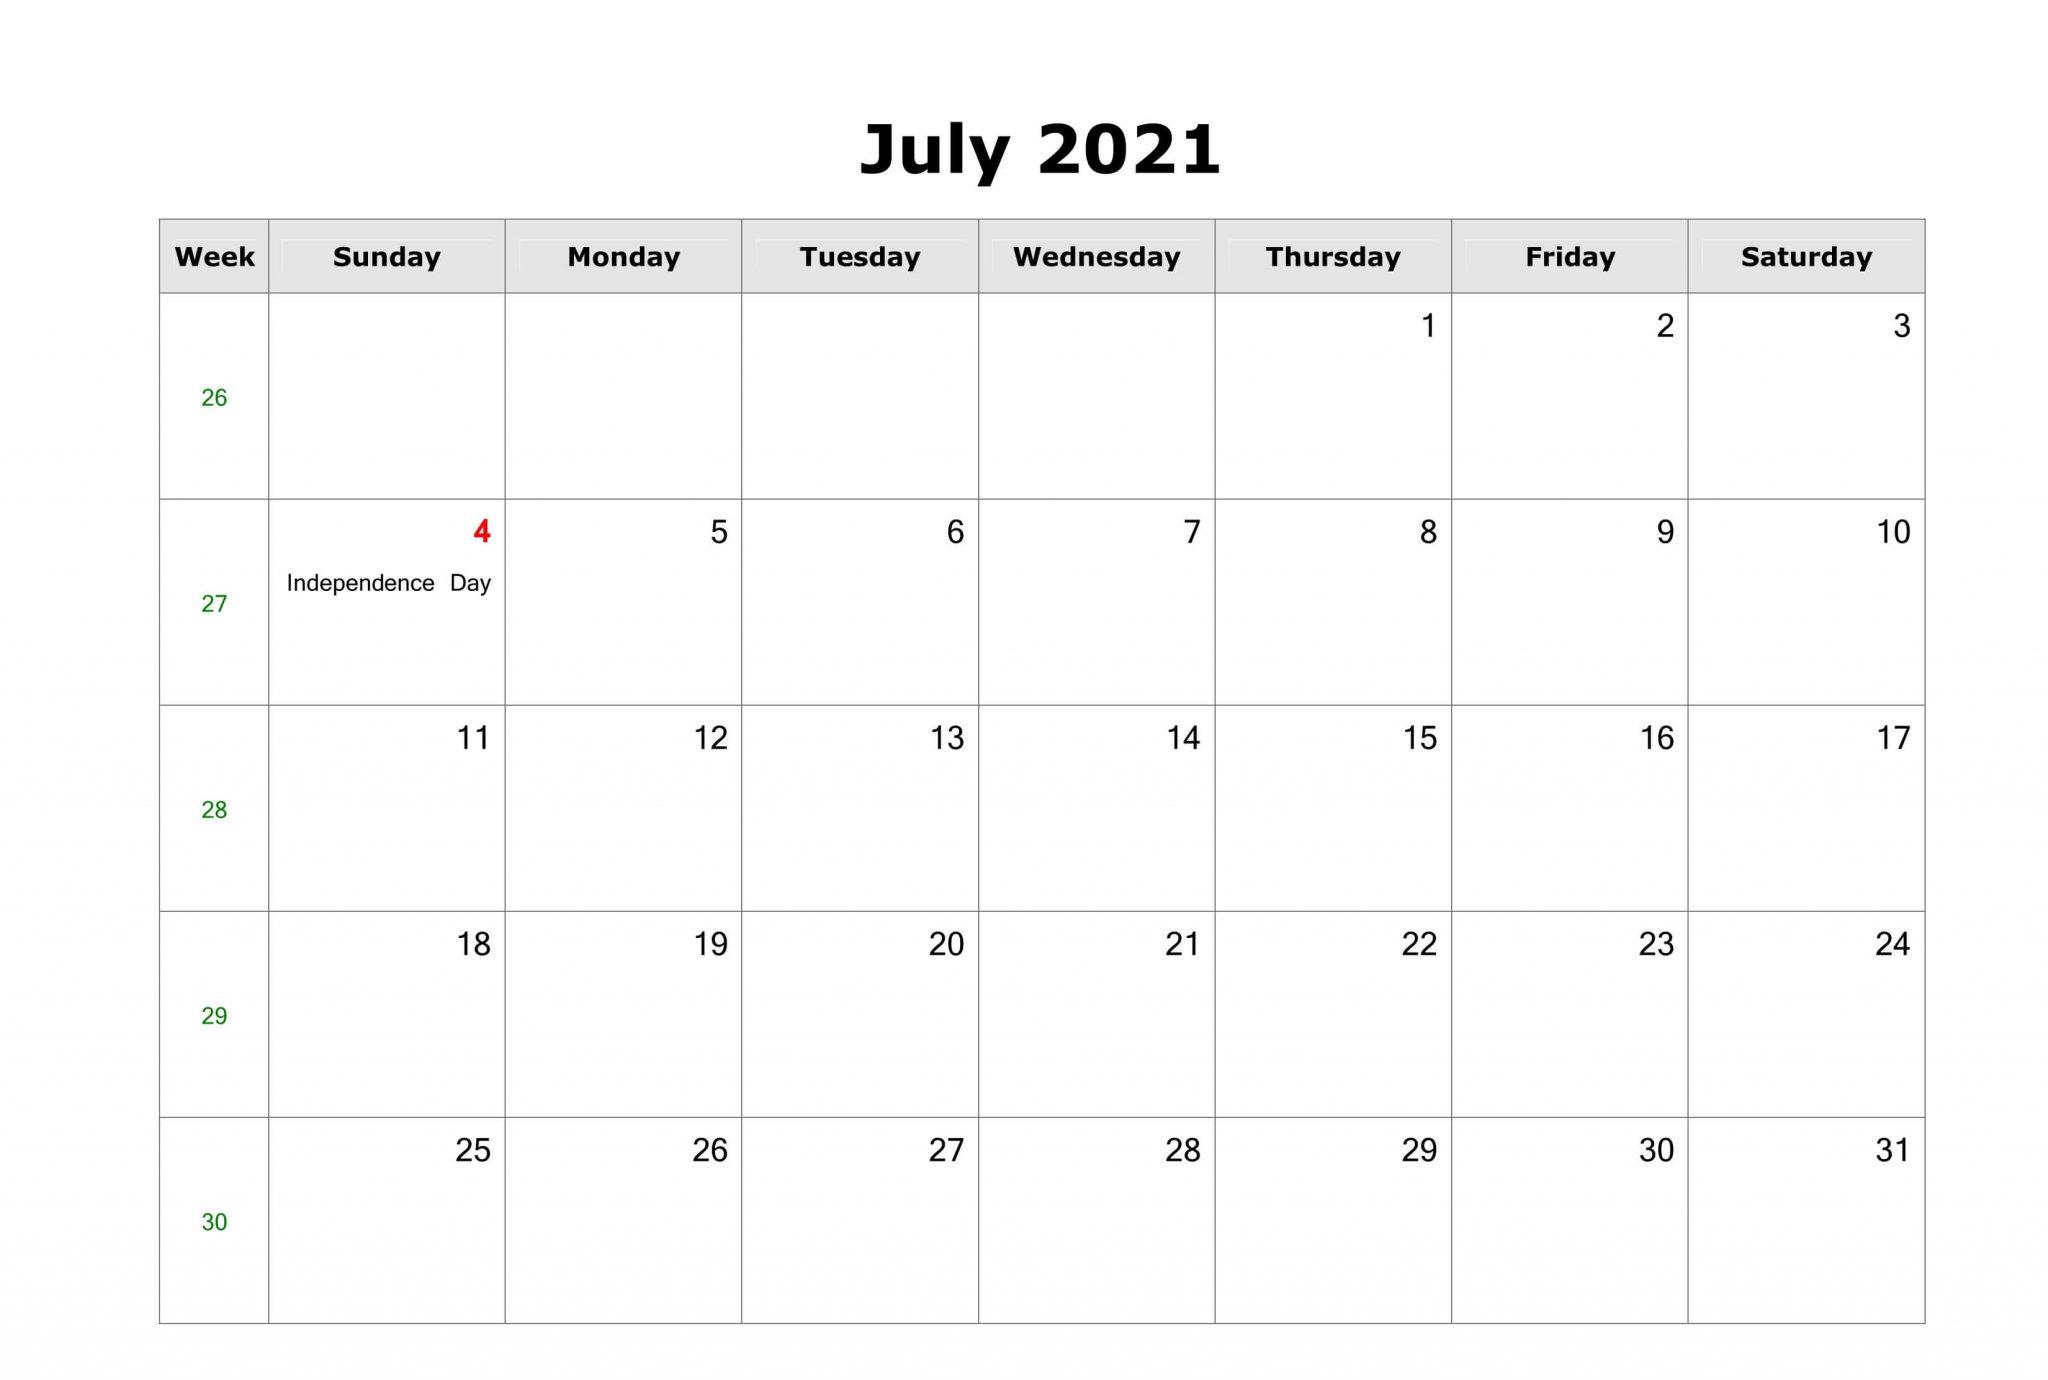 July 2021 Calendar for Office